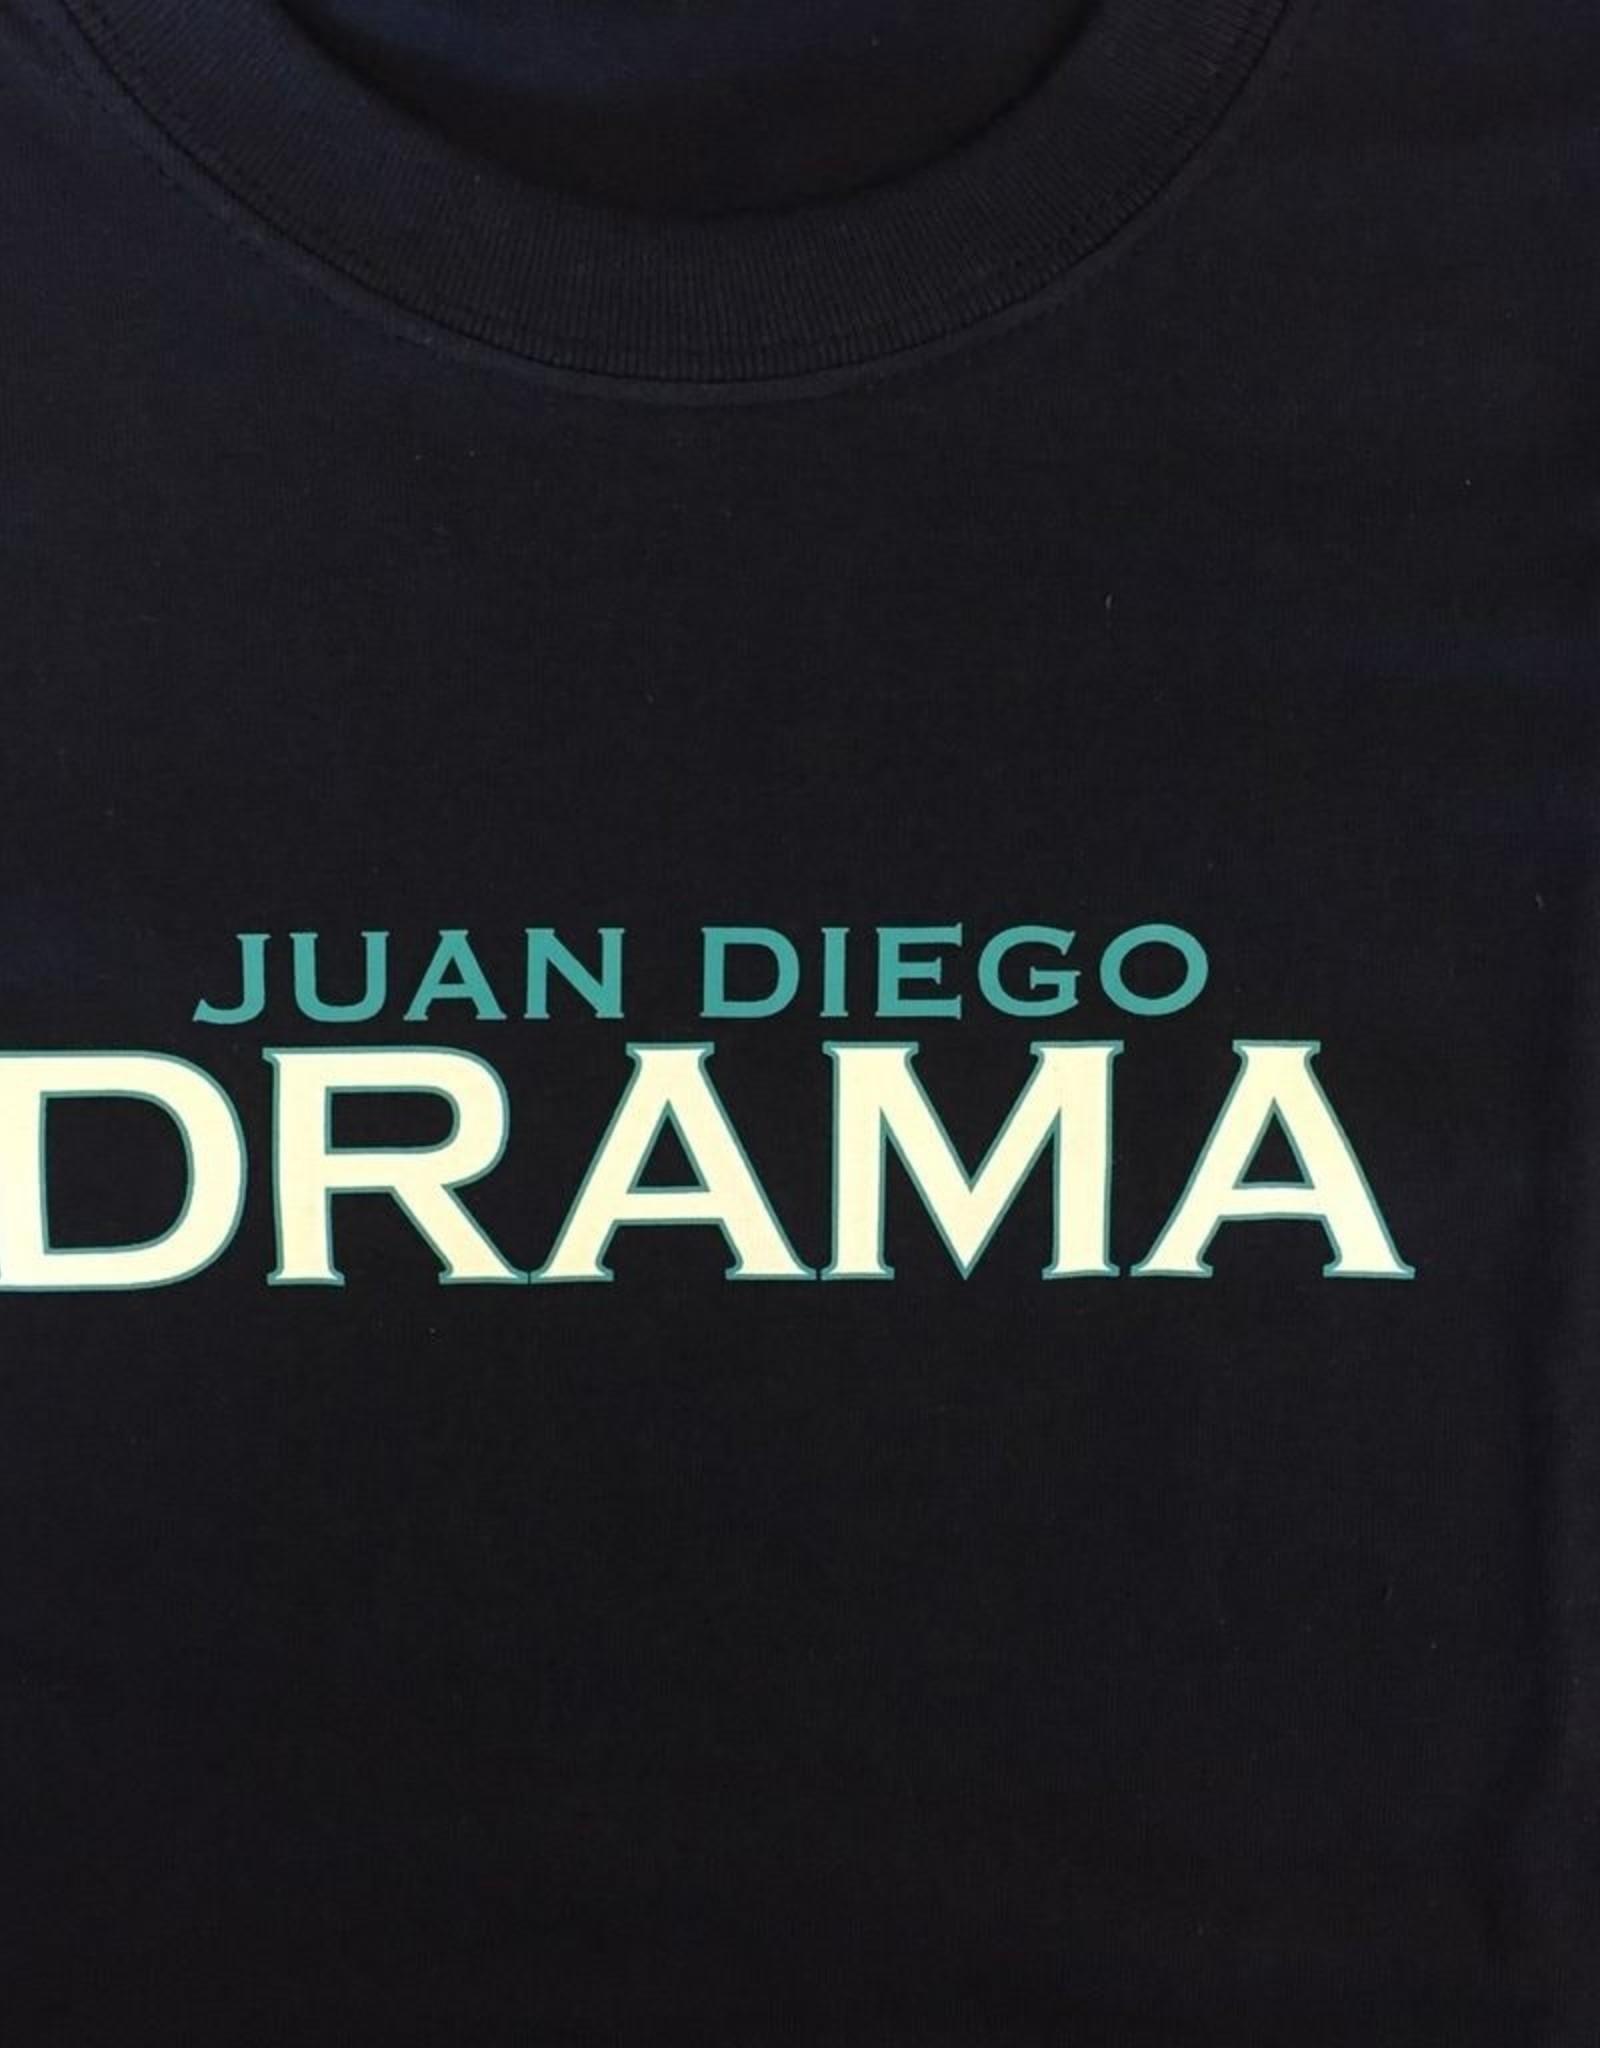 NON-UNIFORM Drama, Juan Diego Drama Custom Order Navy Unisex s/s t-shirt